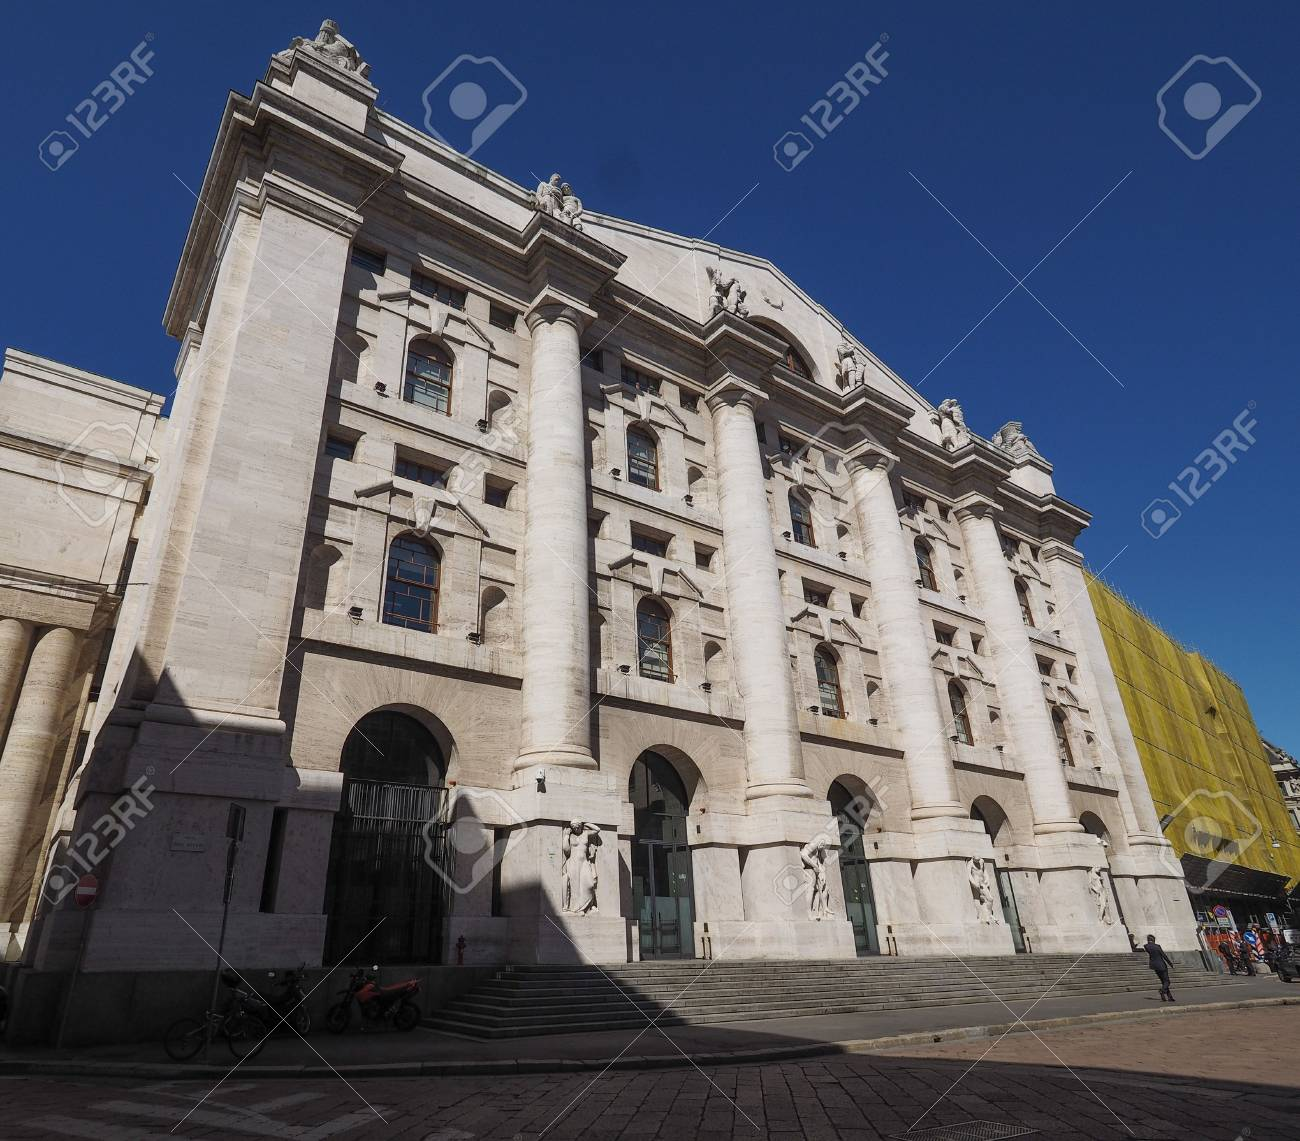 Di MilánEn Bolsa Piazza Milanoque De Cuadrado Borsa Significa Affari MilánItalia pqUzMLVGS